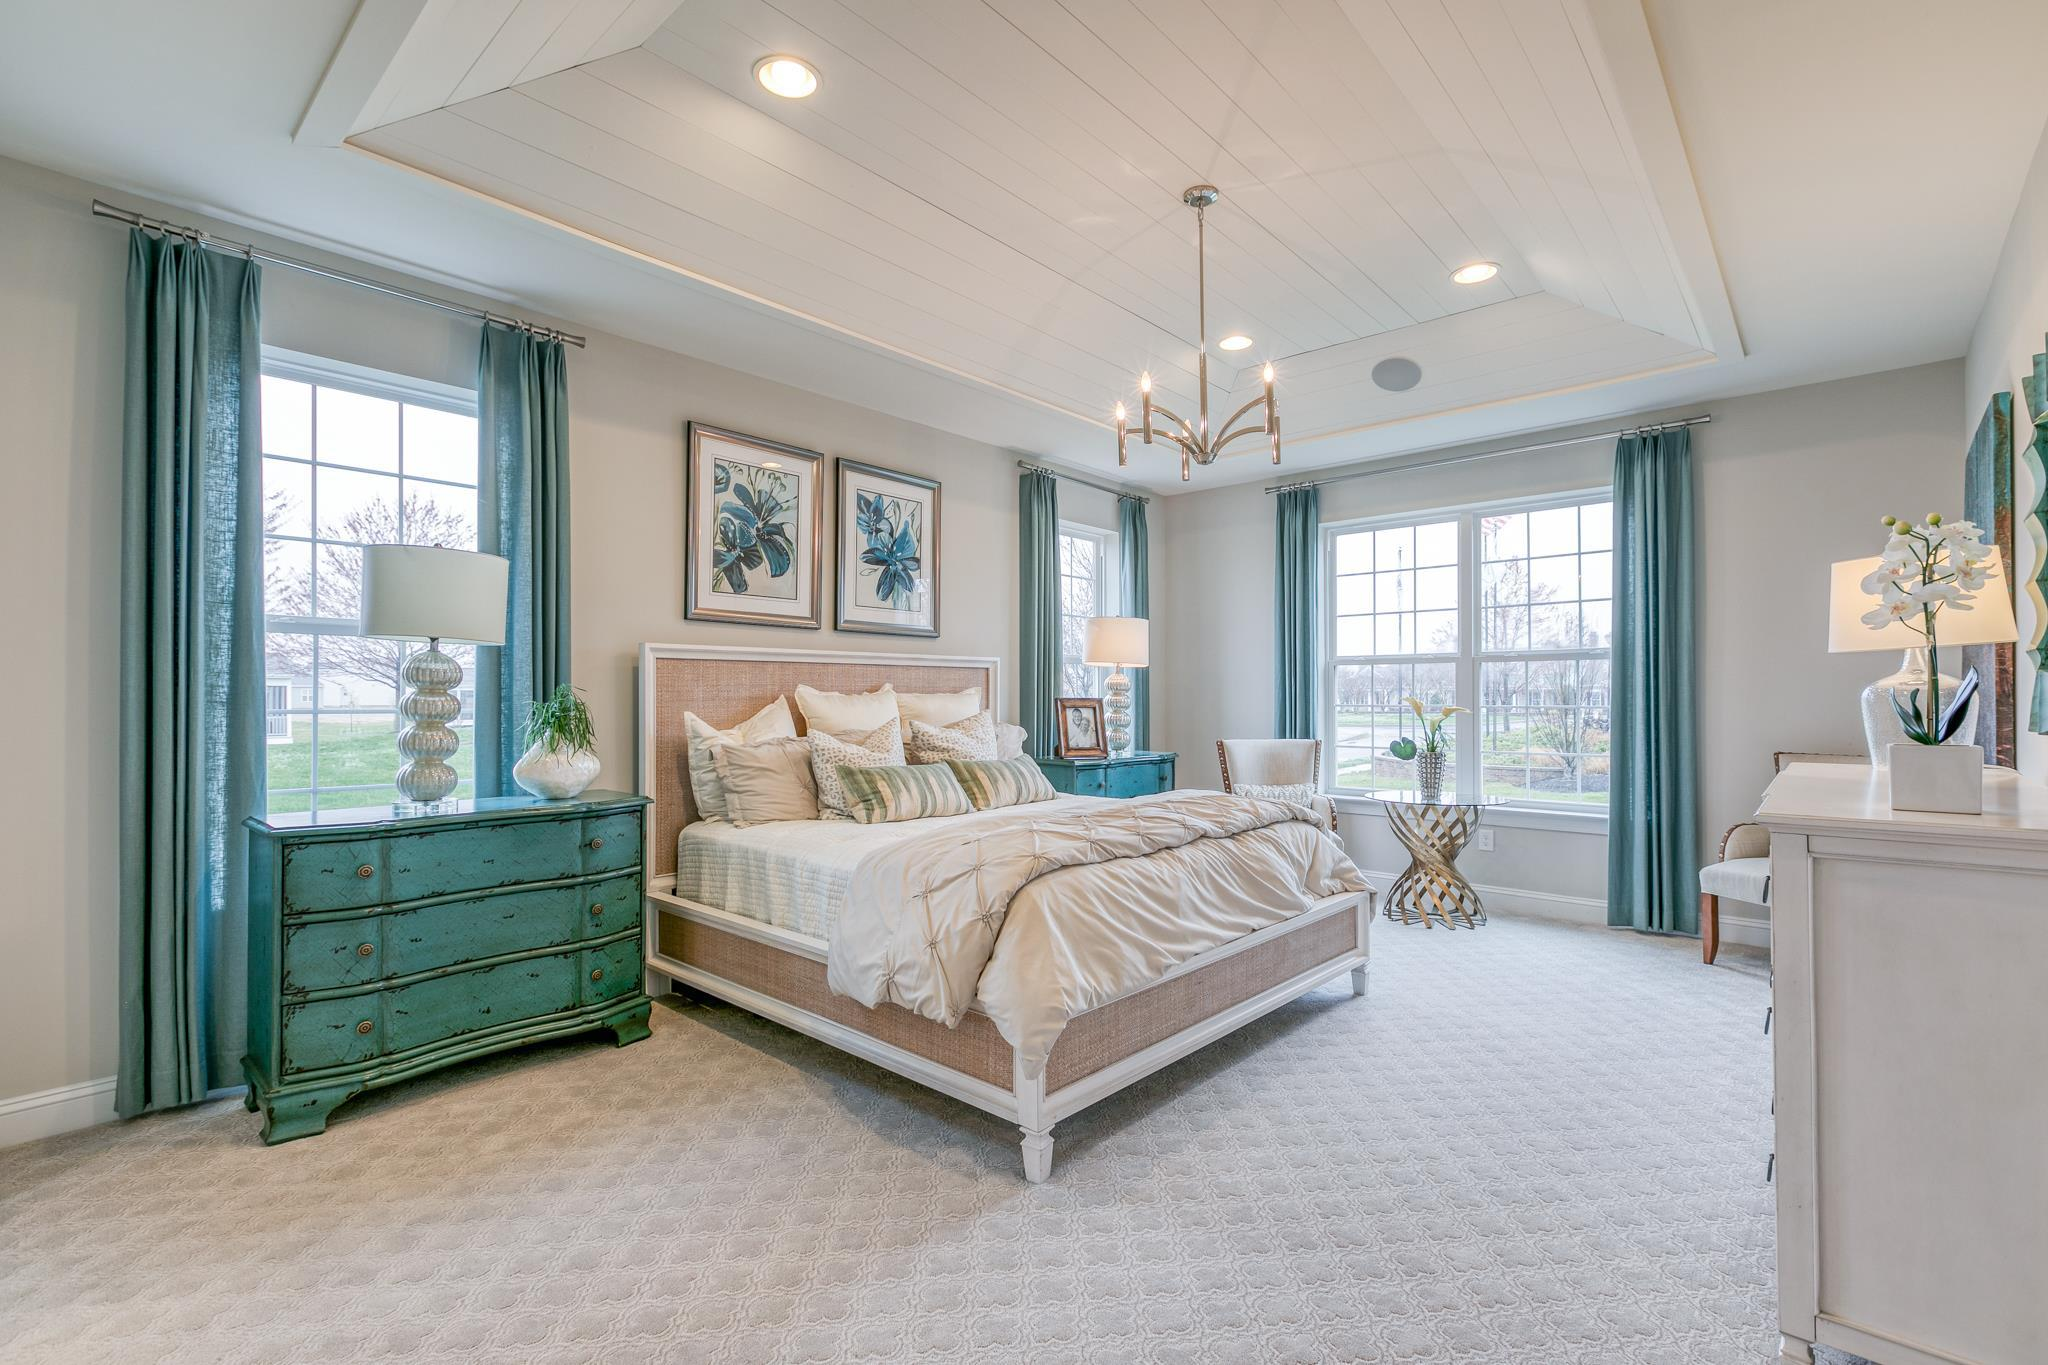 Bedroom featured in The Dalton By McKee Builders in Dover, DE